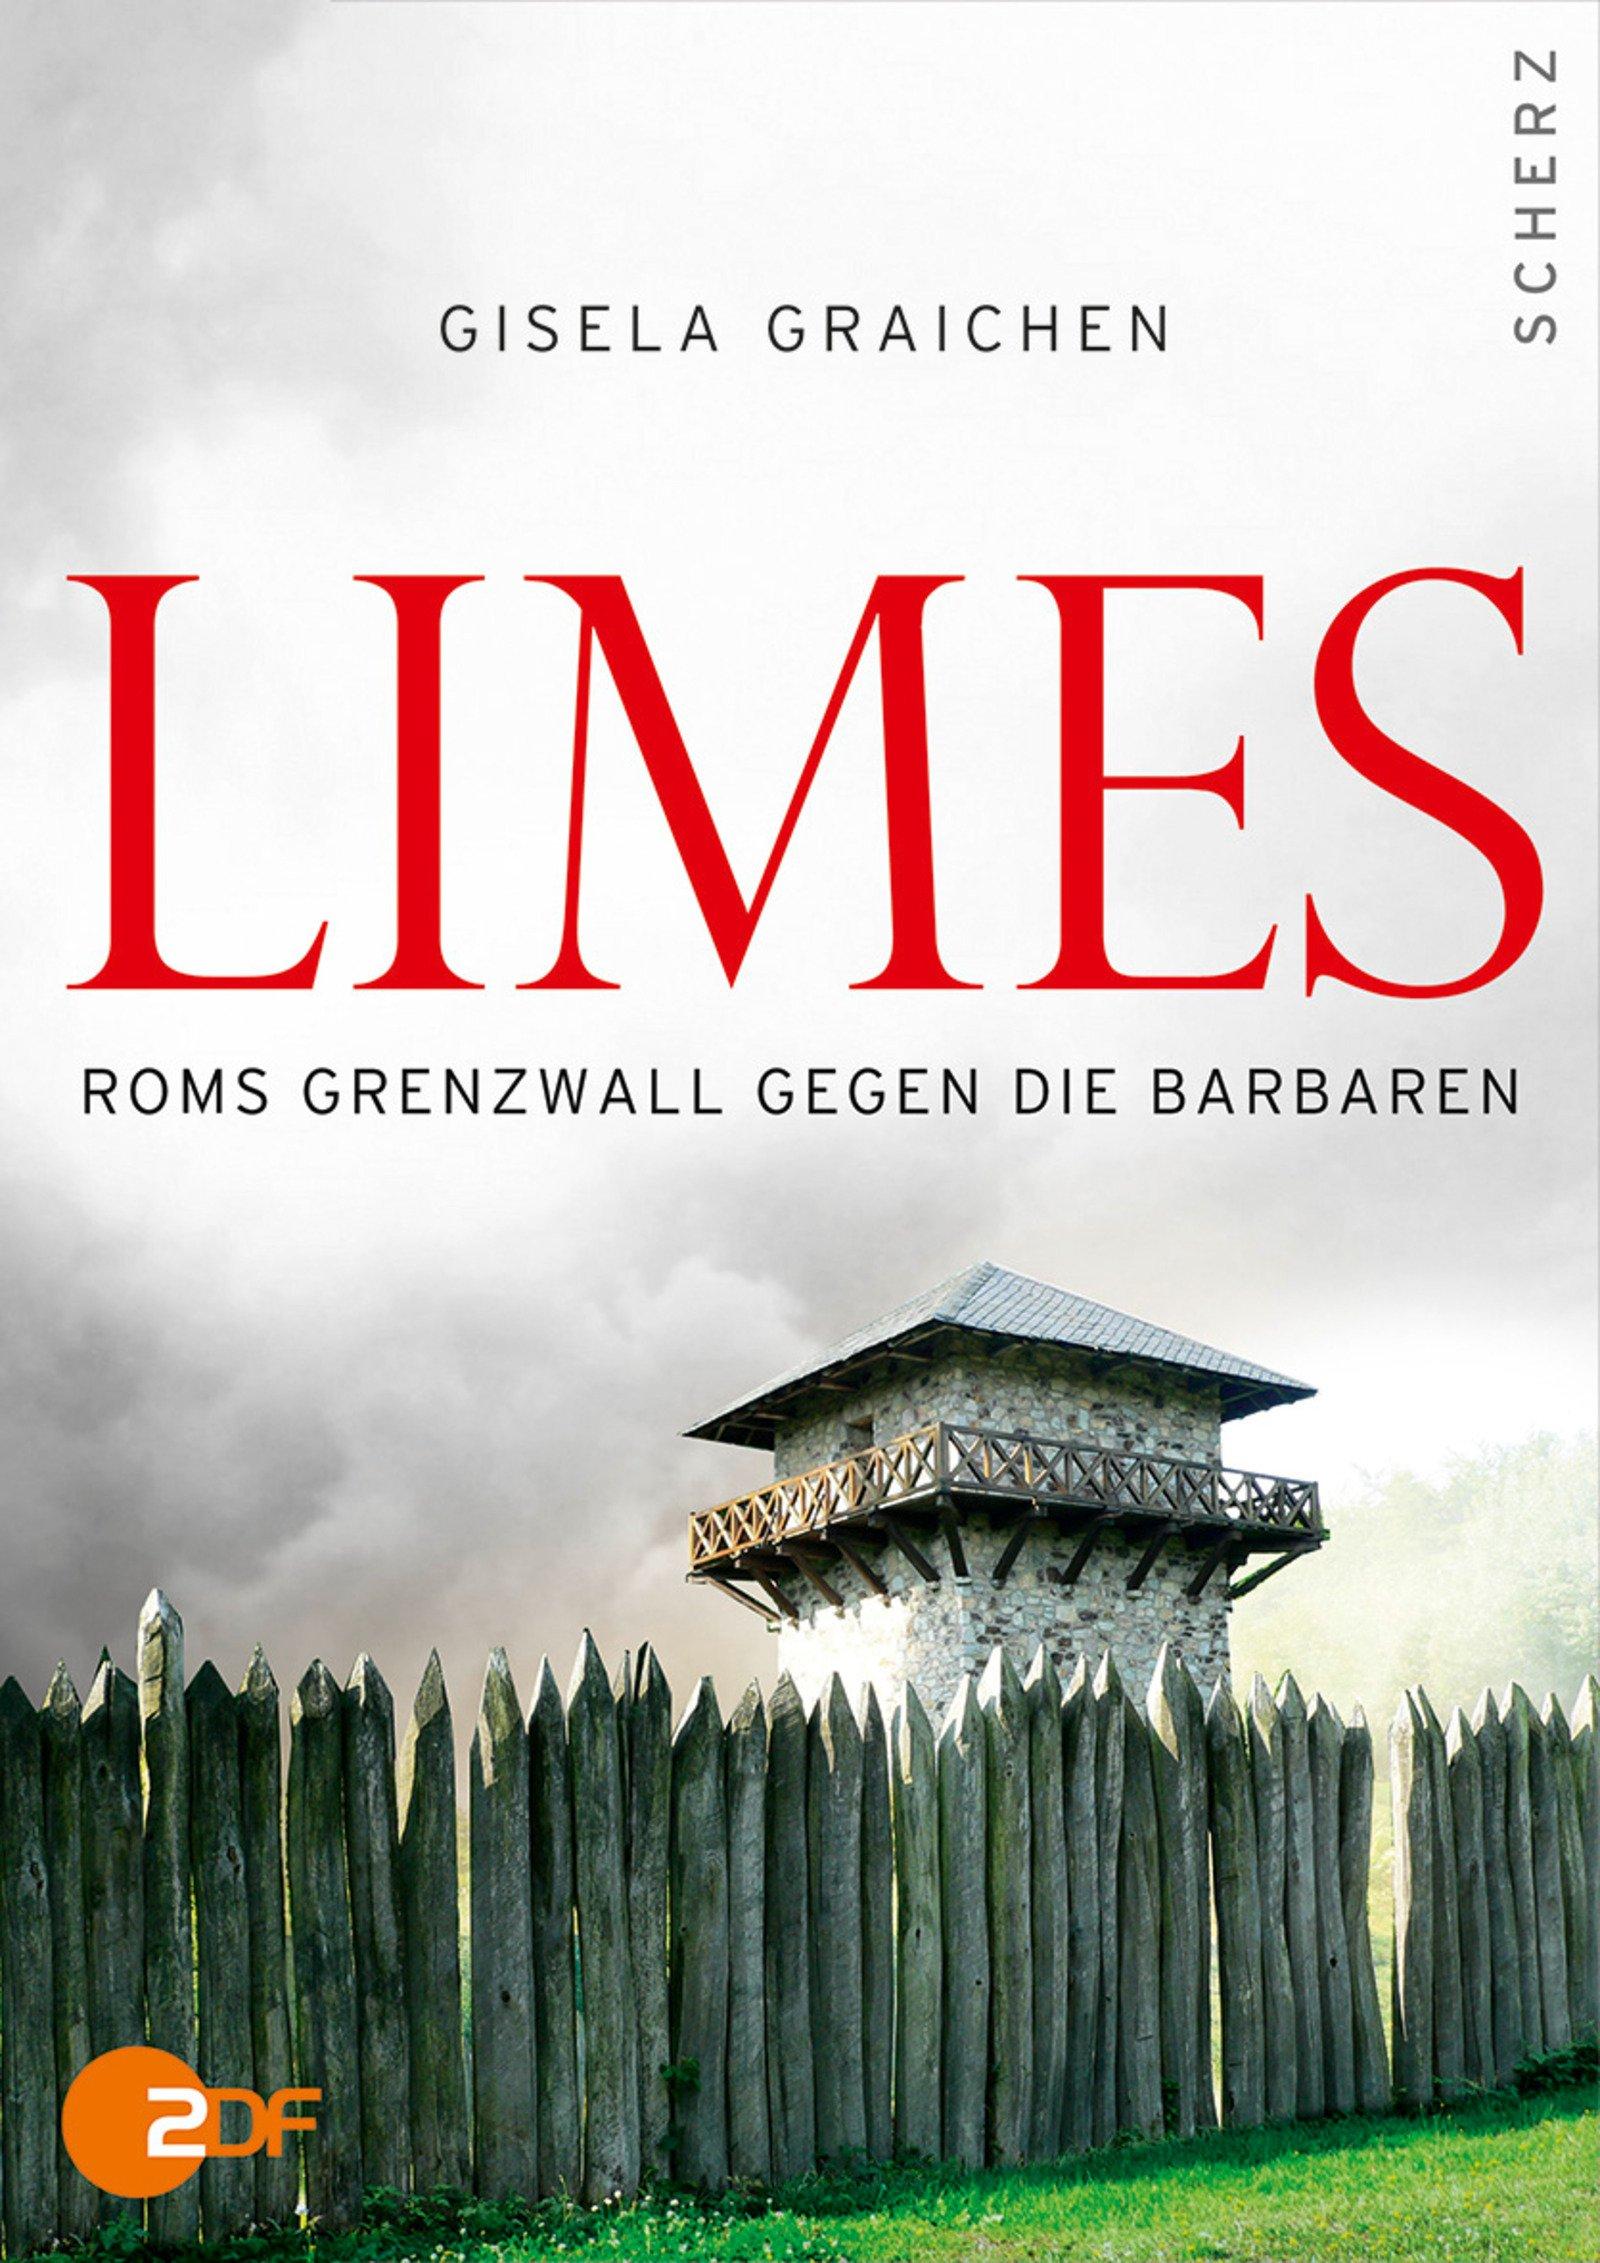 Limes: Roms Grenzwall gegen die Barbaren